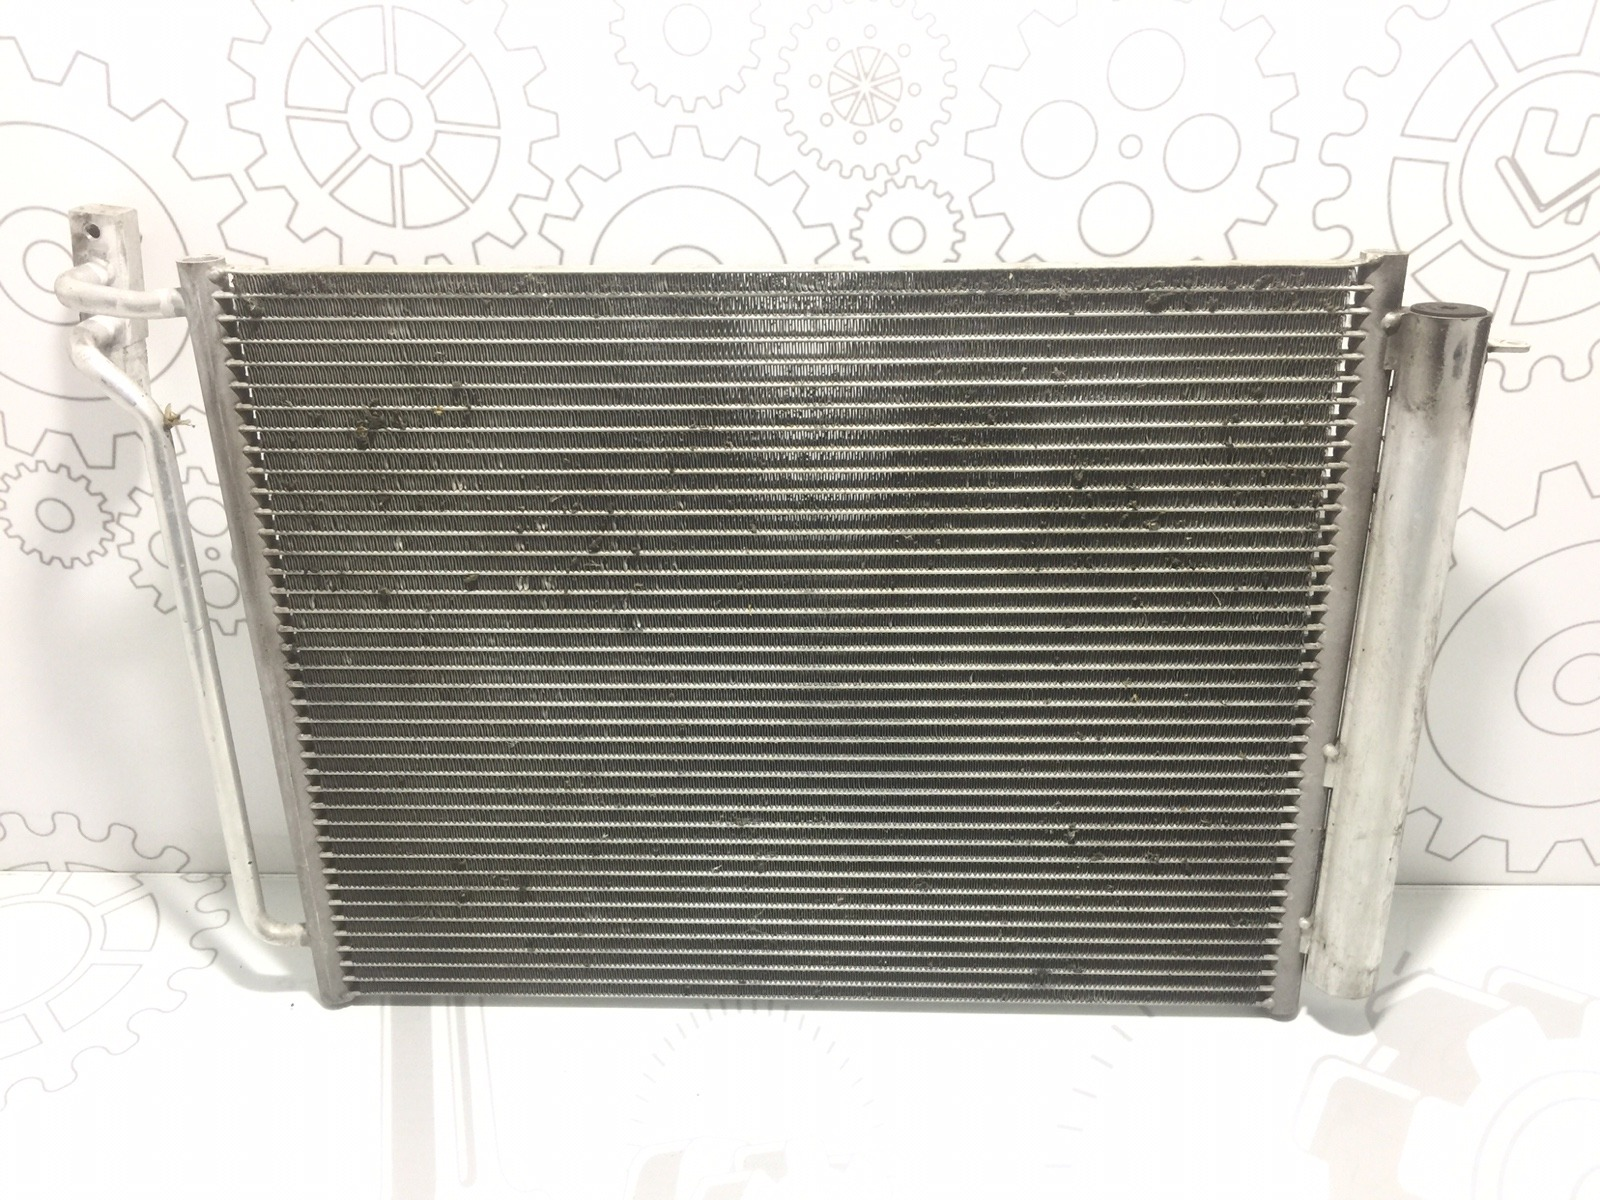 Радиатор кондиционера Bmw X5 E53 3.0 I 2003 (б/у)